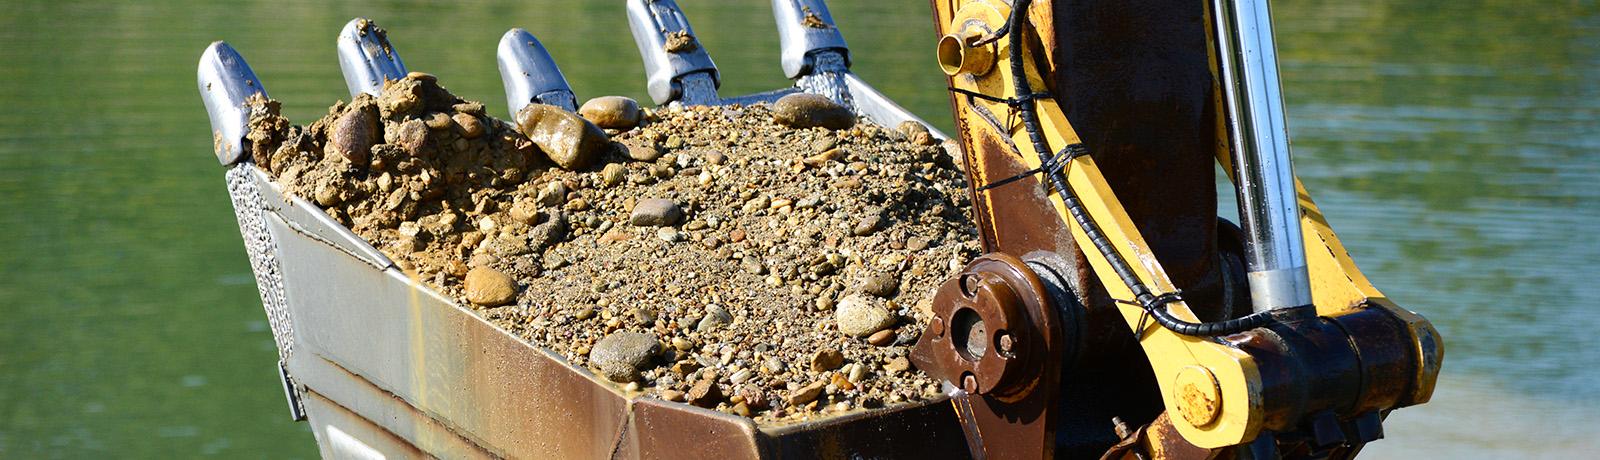 tazba strku tazne stroje anteco strkopiesky horna sec areal tazba strku kamenivo okrasne kamene stavebny material nitra levice unc